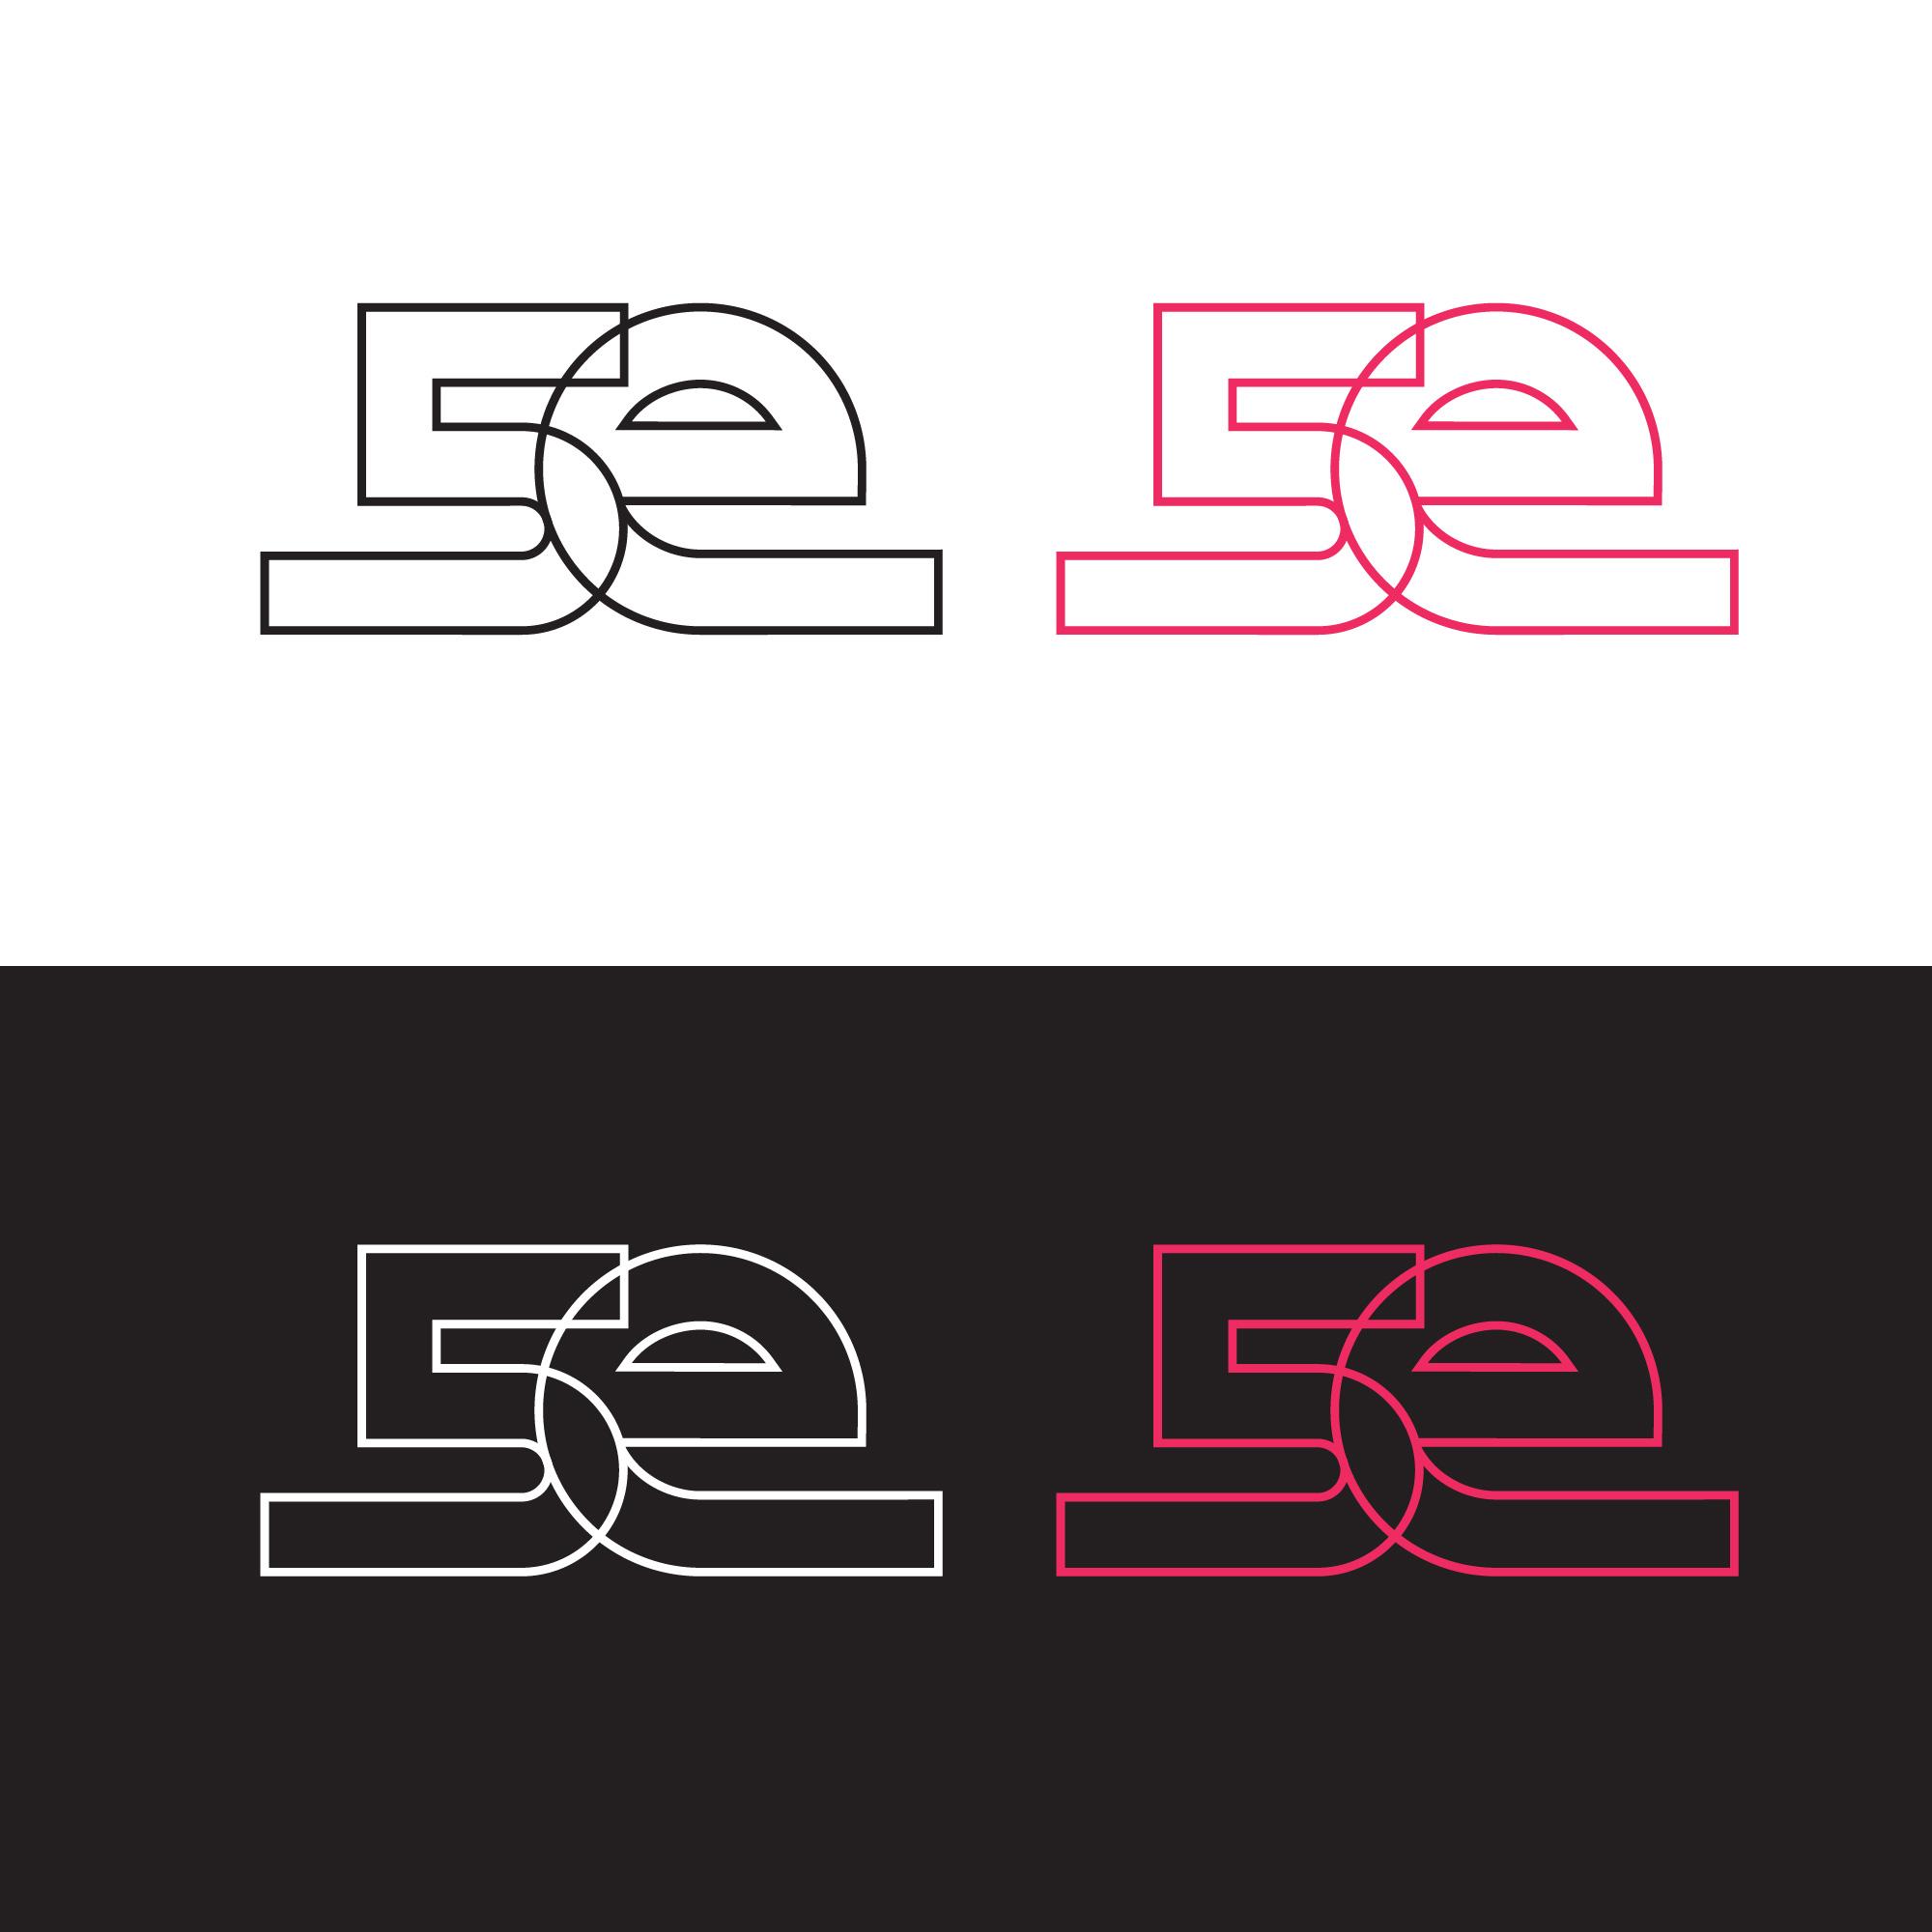 Нарисовать логотип для группы компаний  фото f_5785cdcdde1d036e.jpg